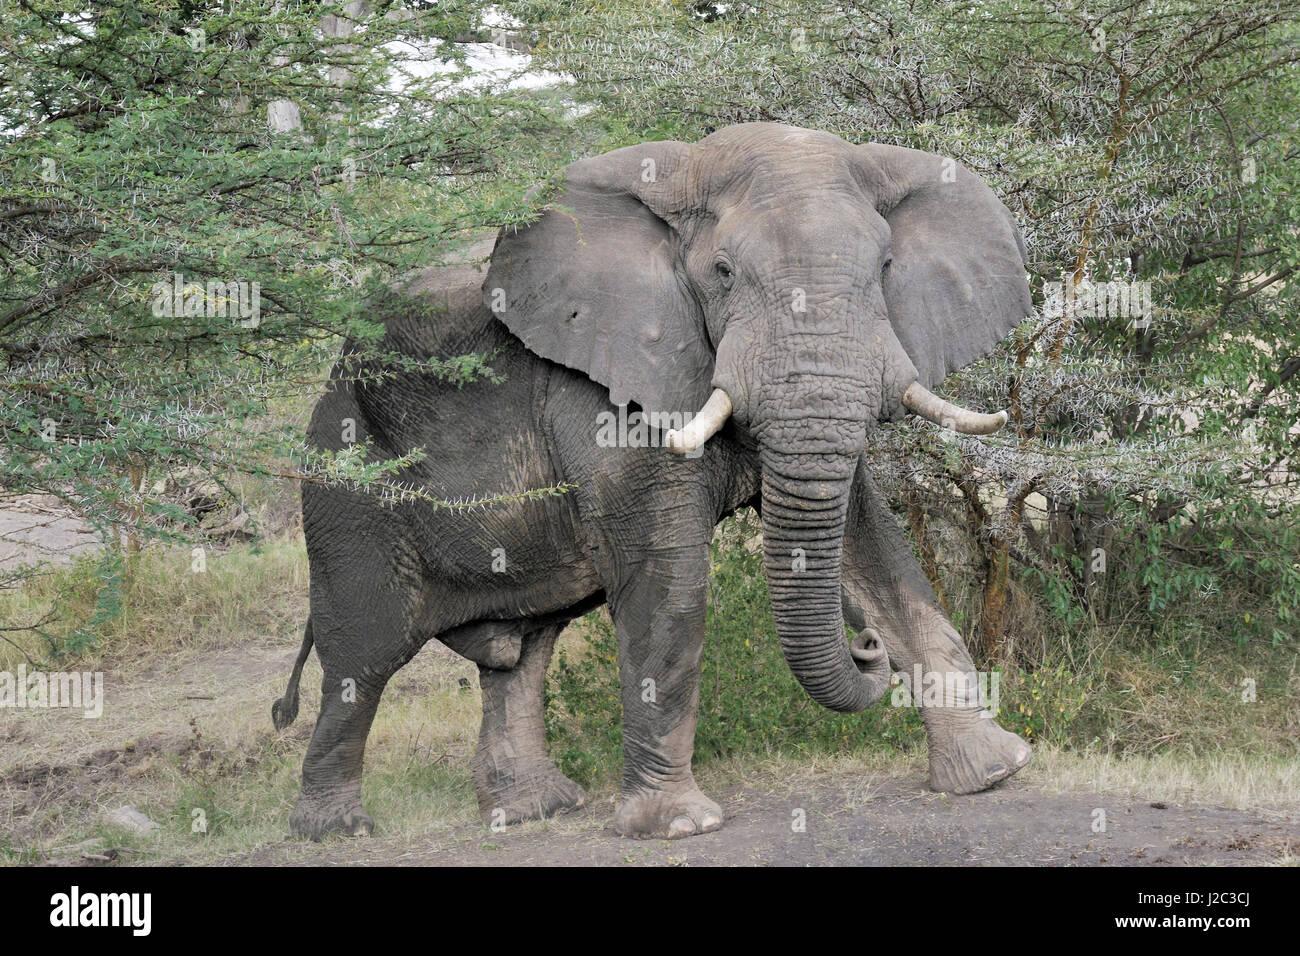 African elephant (Loxodonta africana) between acaciatree, looking at camera, Serengeti national park, Tanzania. - Stock Image